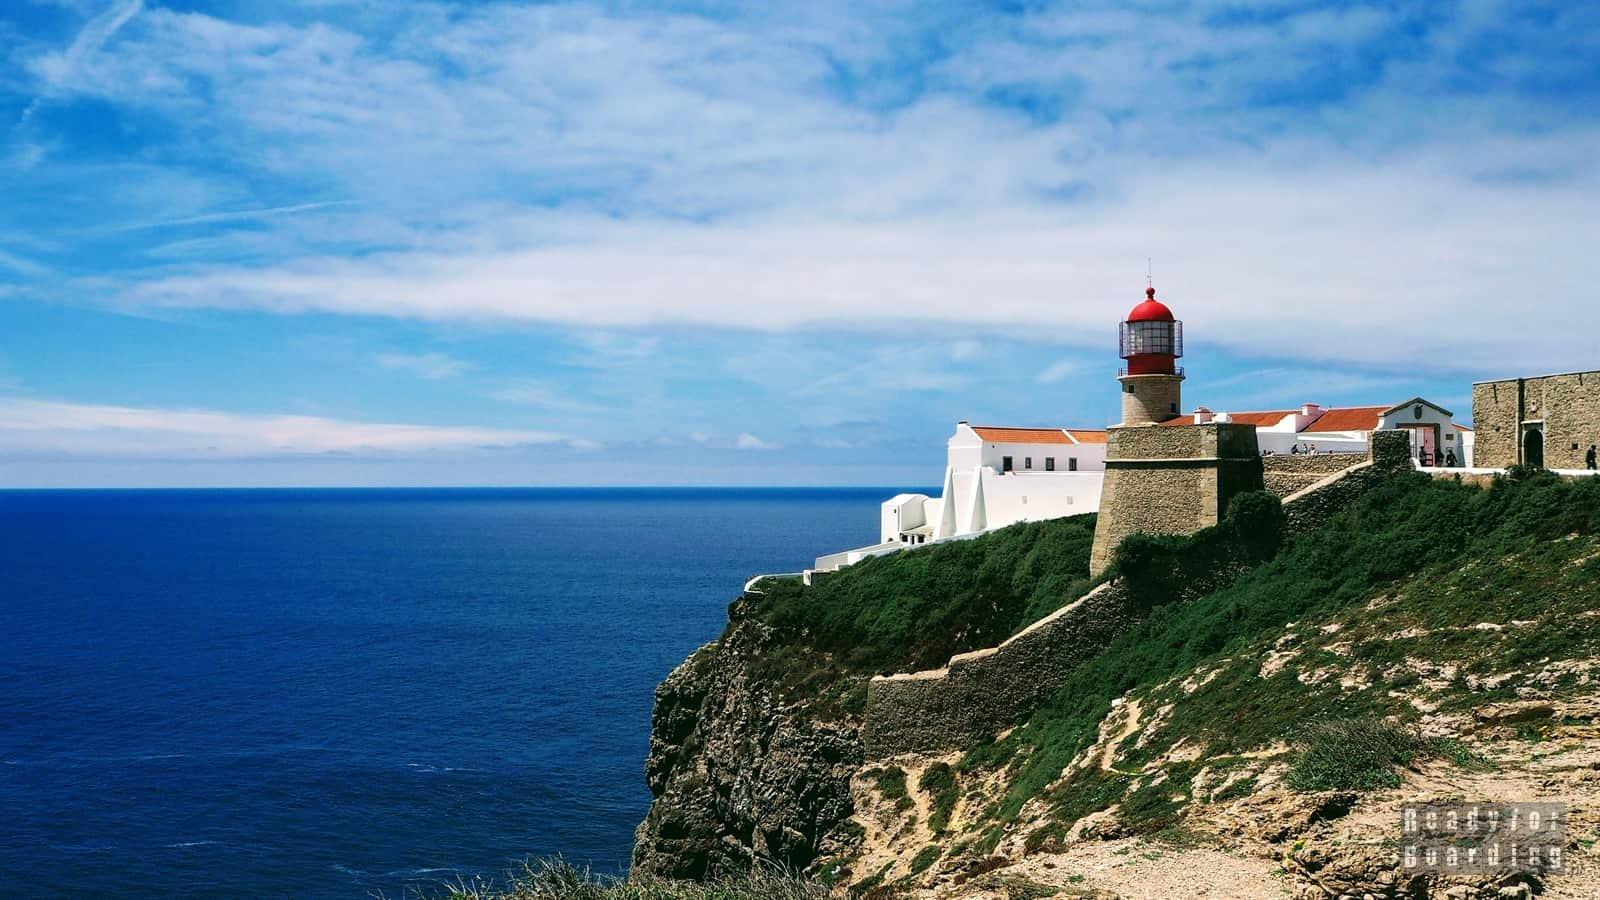 Portugalia, Algarve - Cabo de Sao Vicente i Faro (galeria zdjęć)